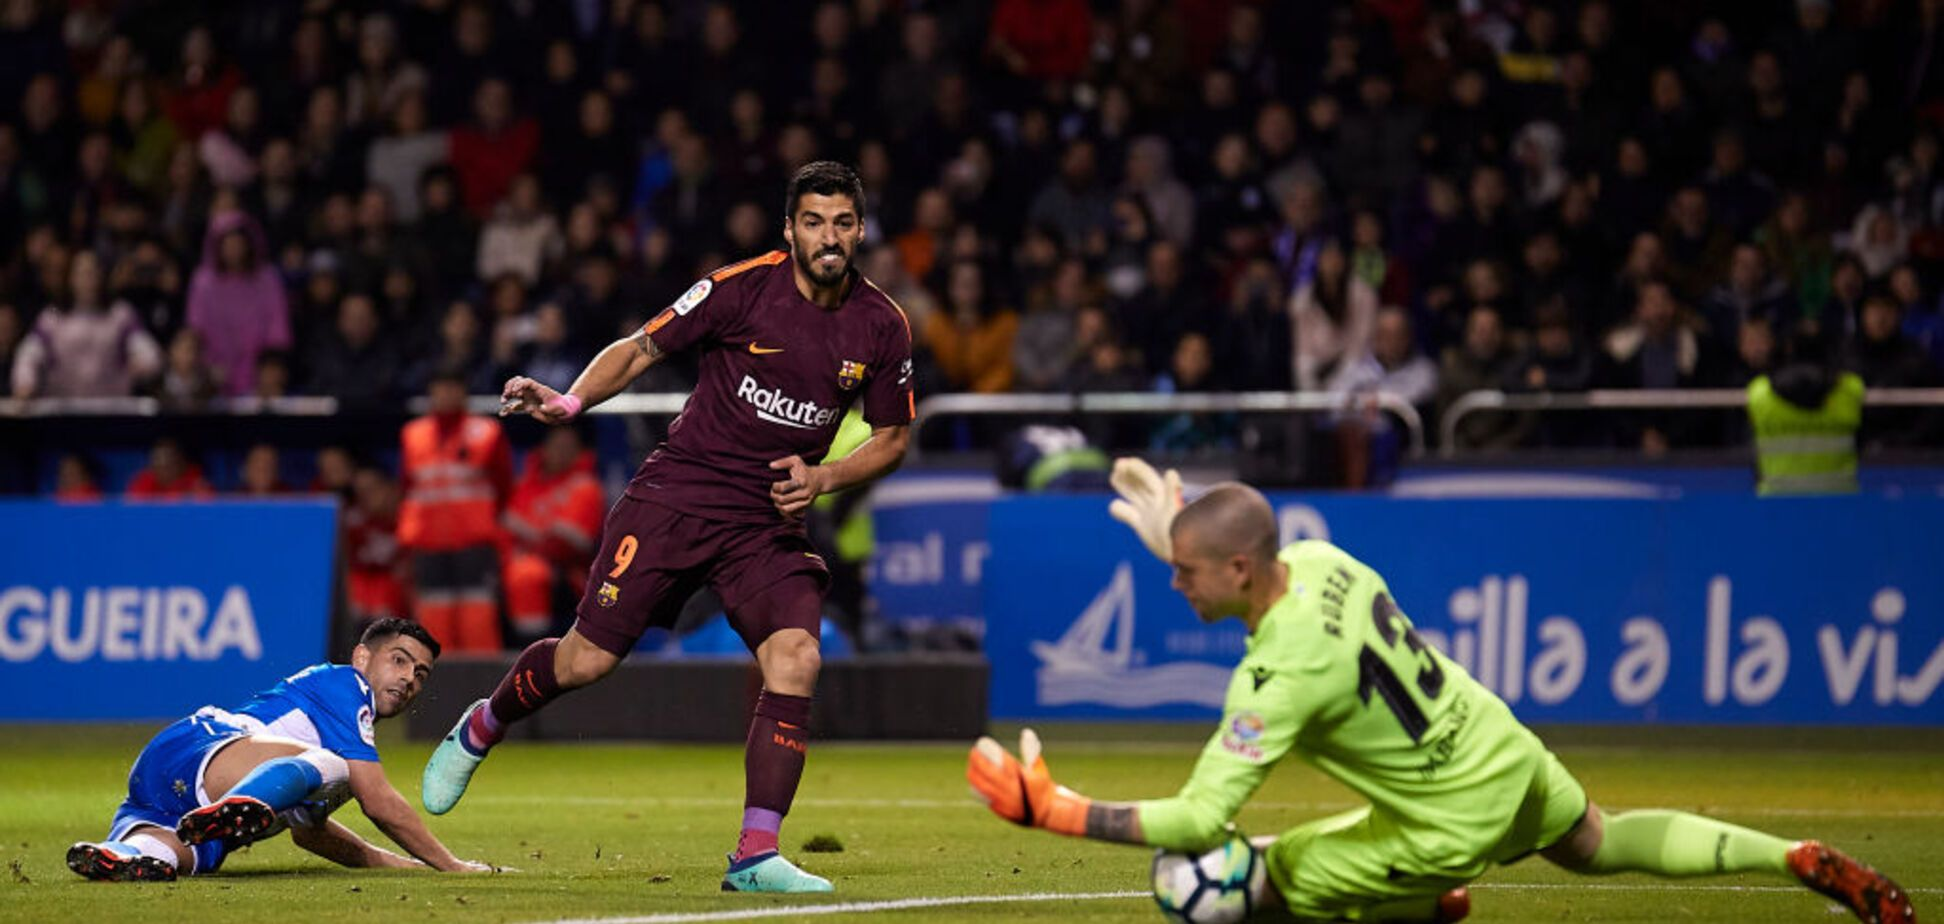 'Барселона' досрочно выиграла чемпионат Испании